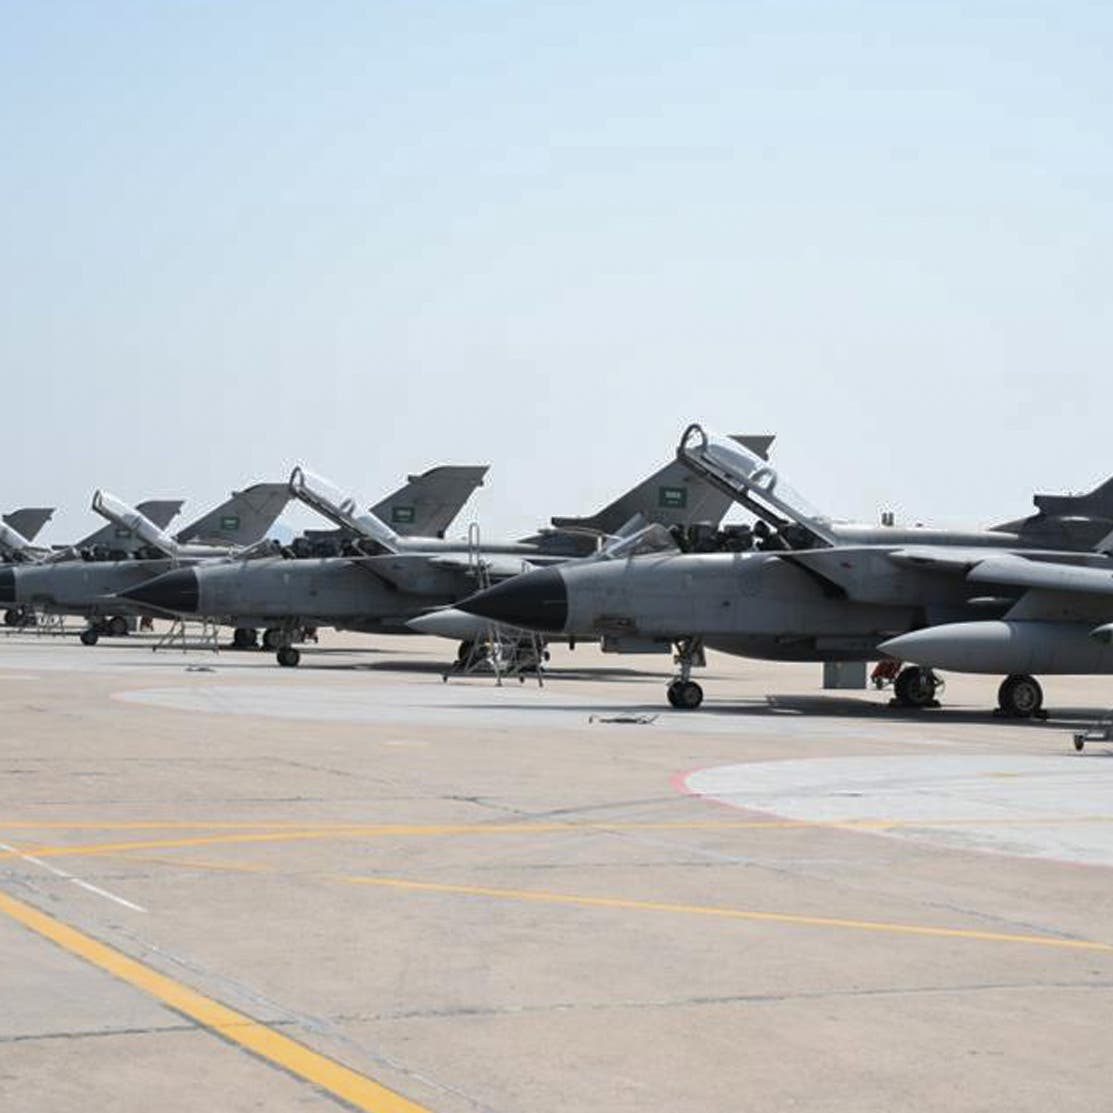 Saudi's World Defense Show reveals 'overwhelming' interest: Organizers